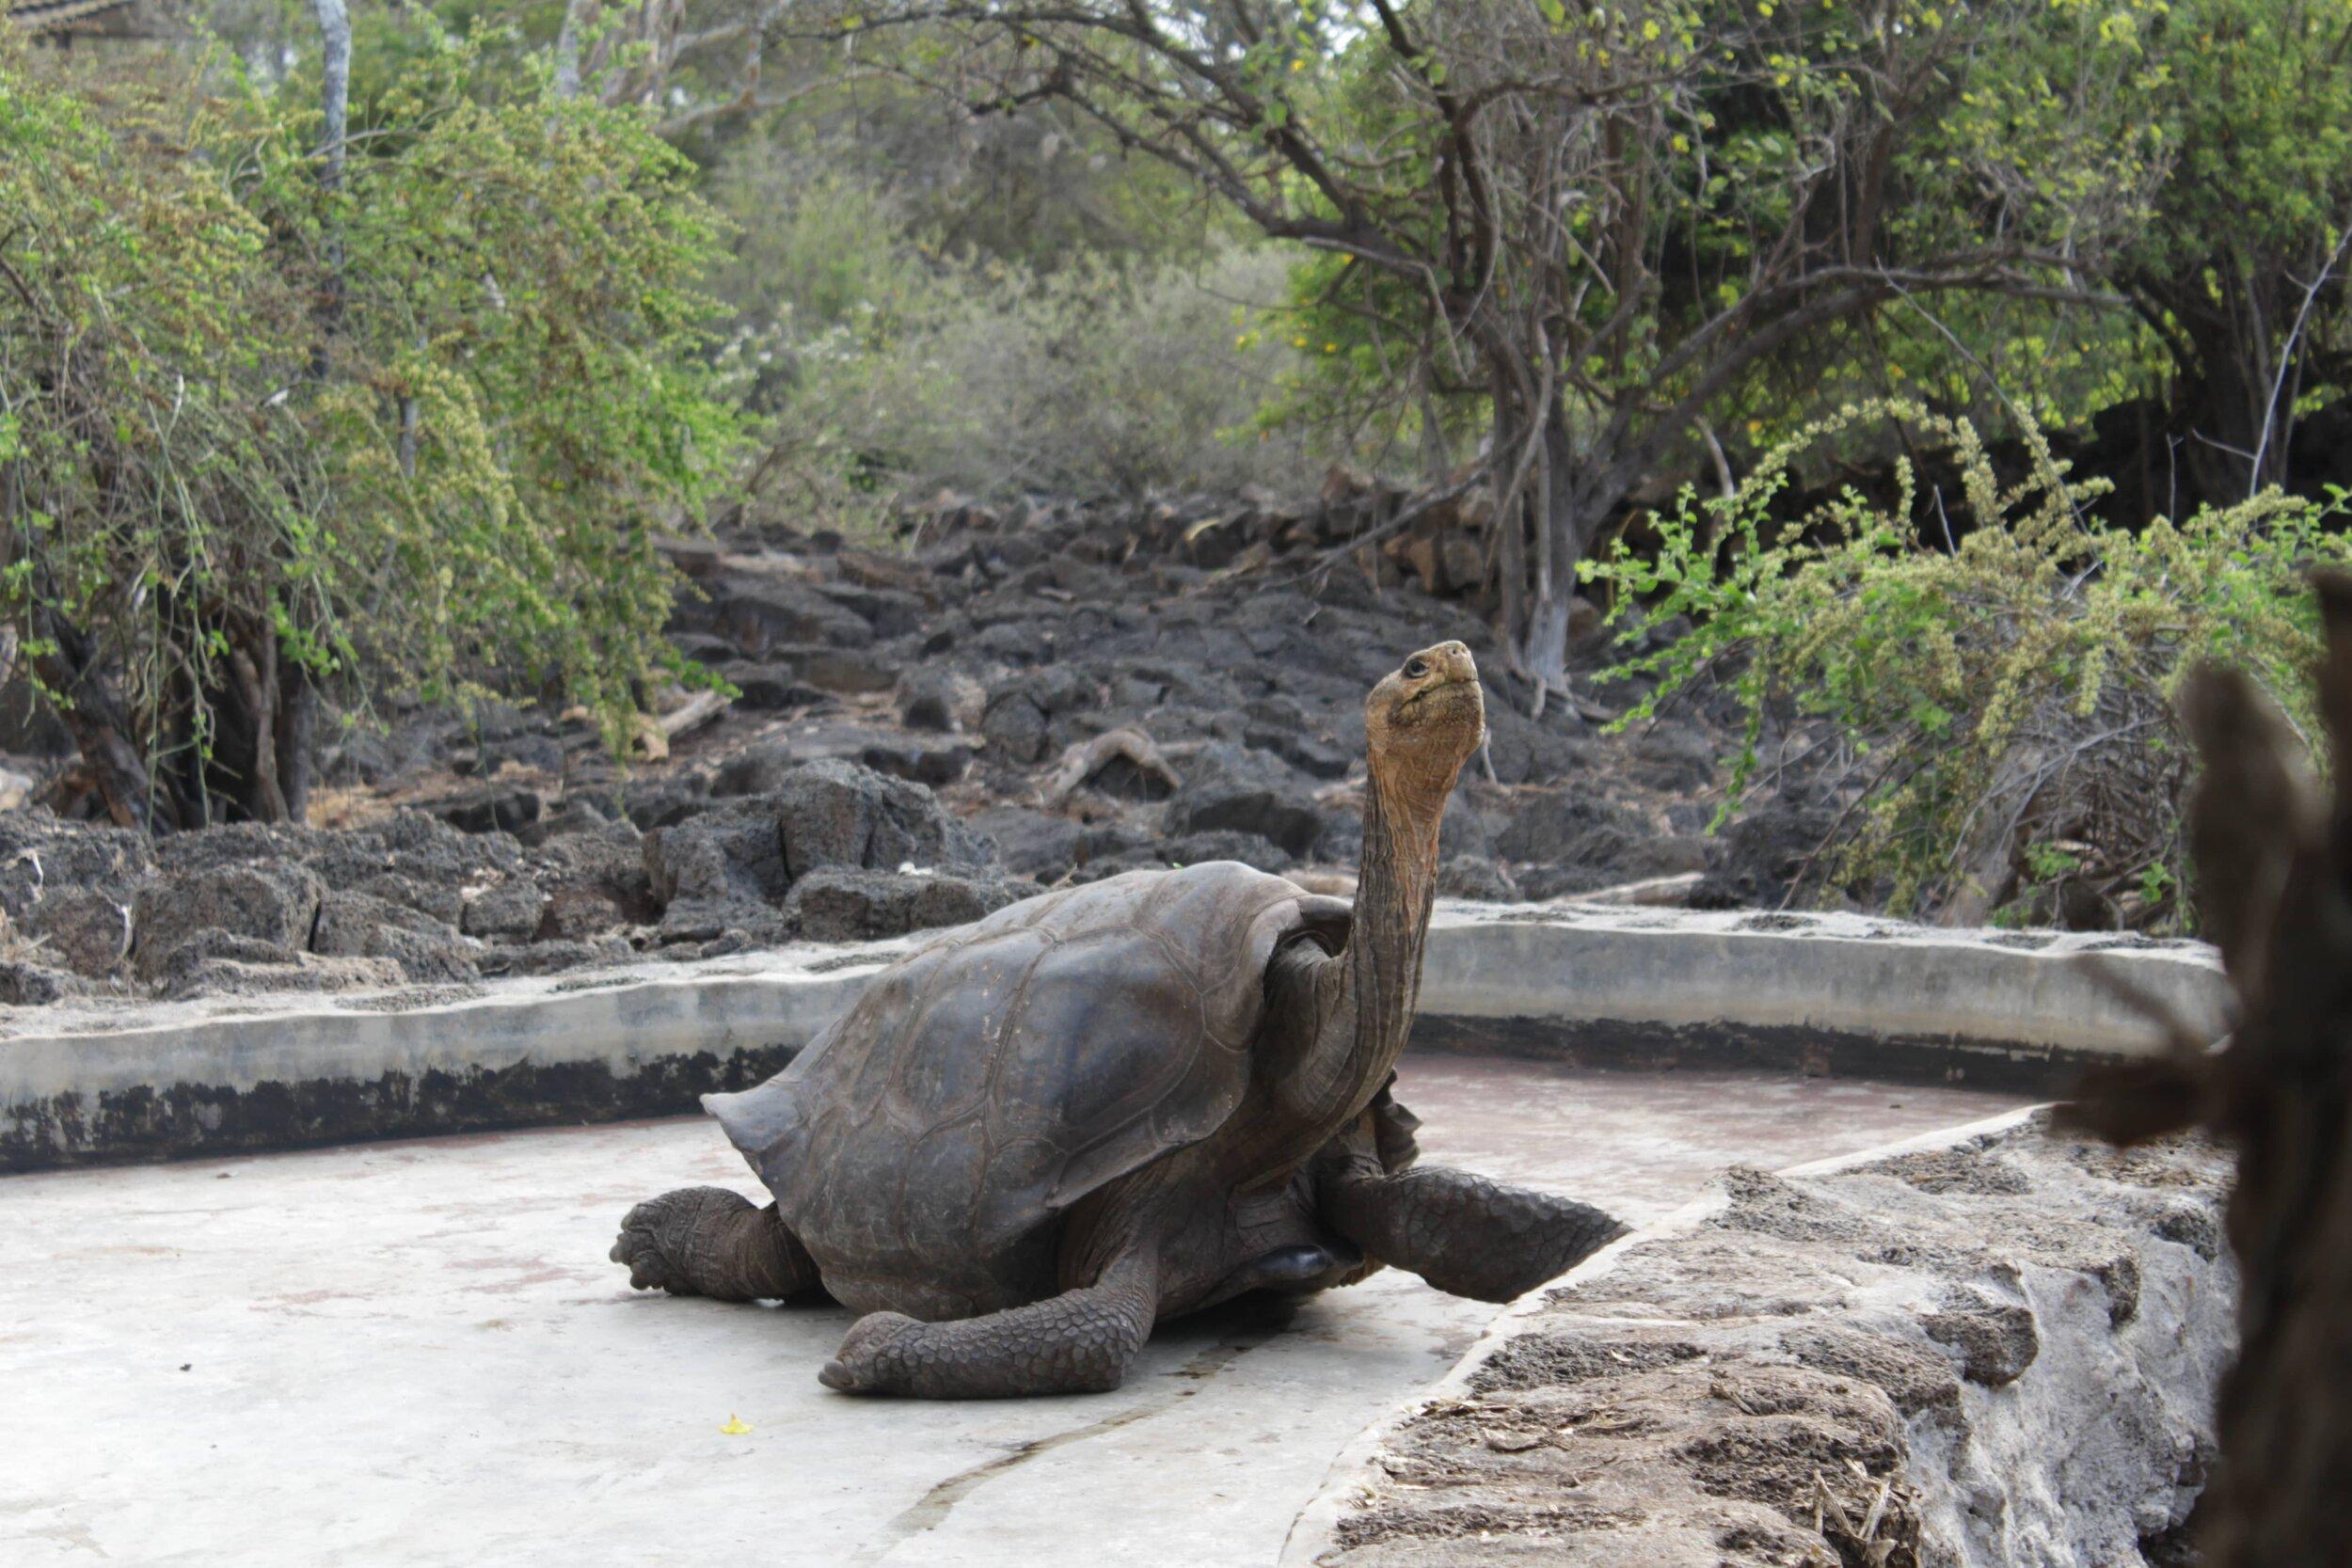 Theory Cruise Tortoise